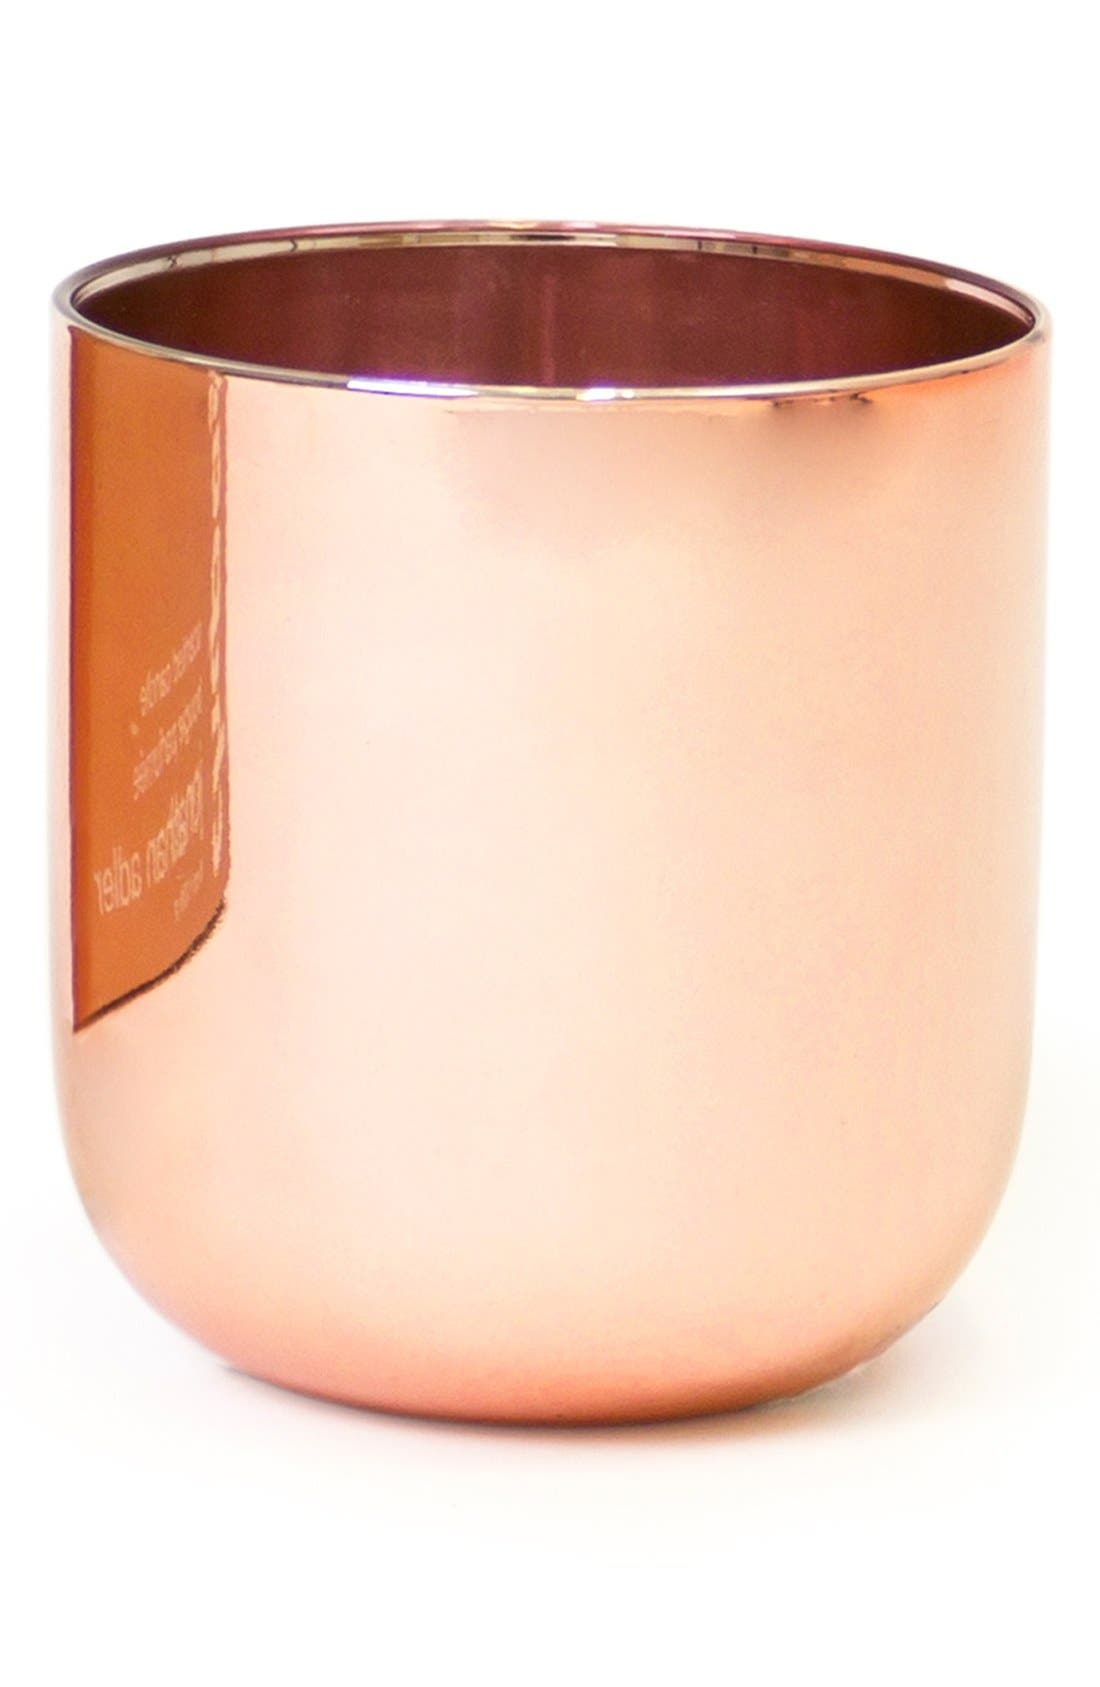 Alternate Image 1 Selected - Jonathan Adler 'Champagne Pop' Candle